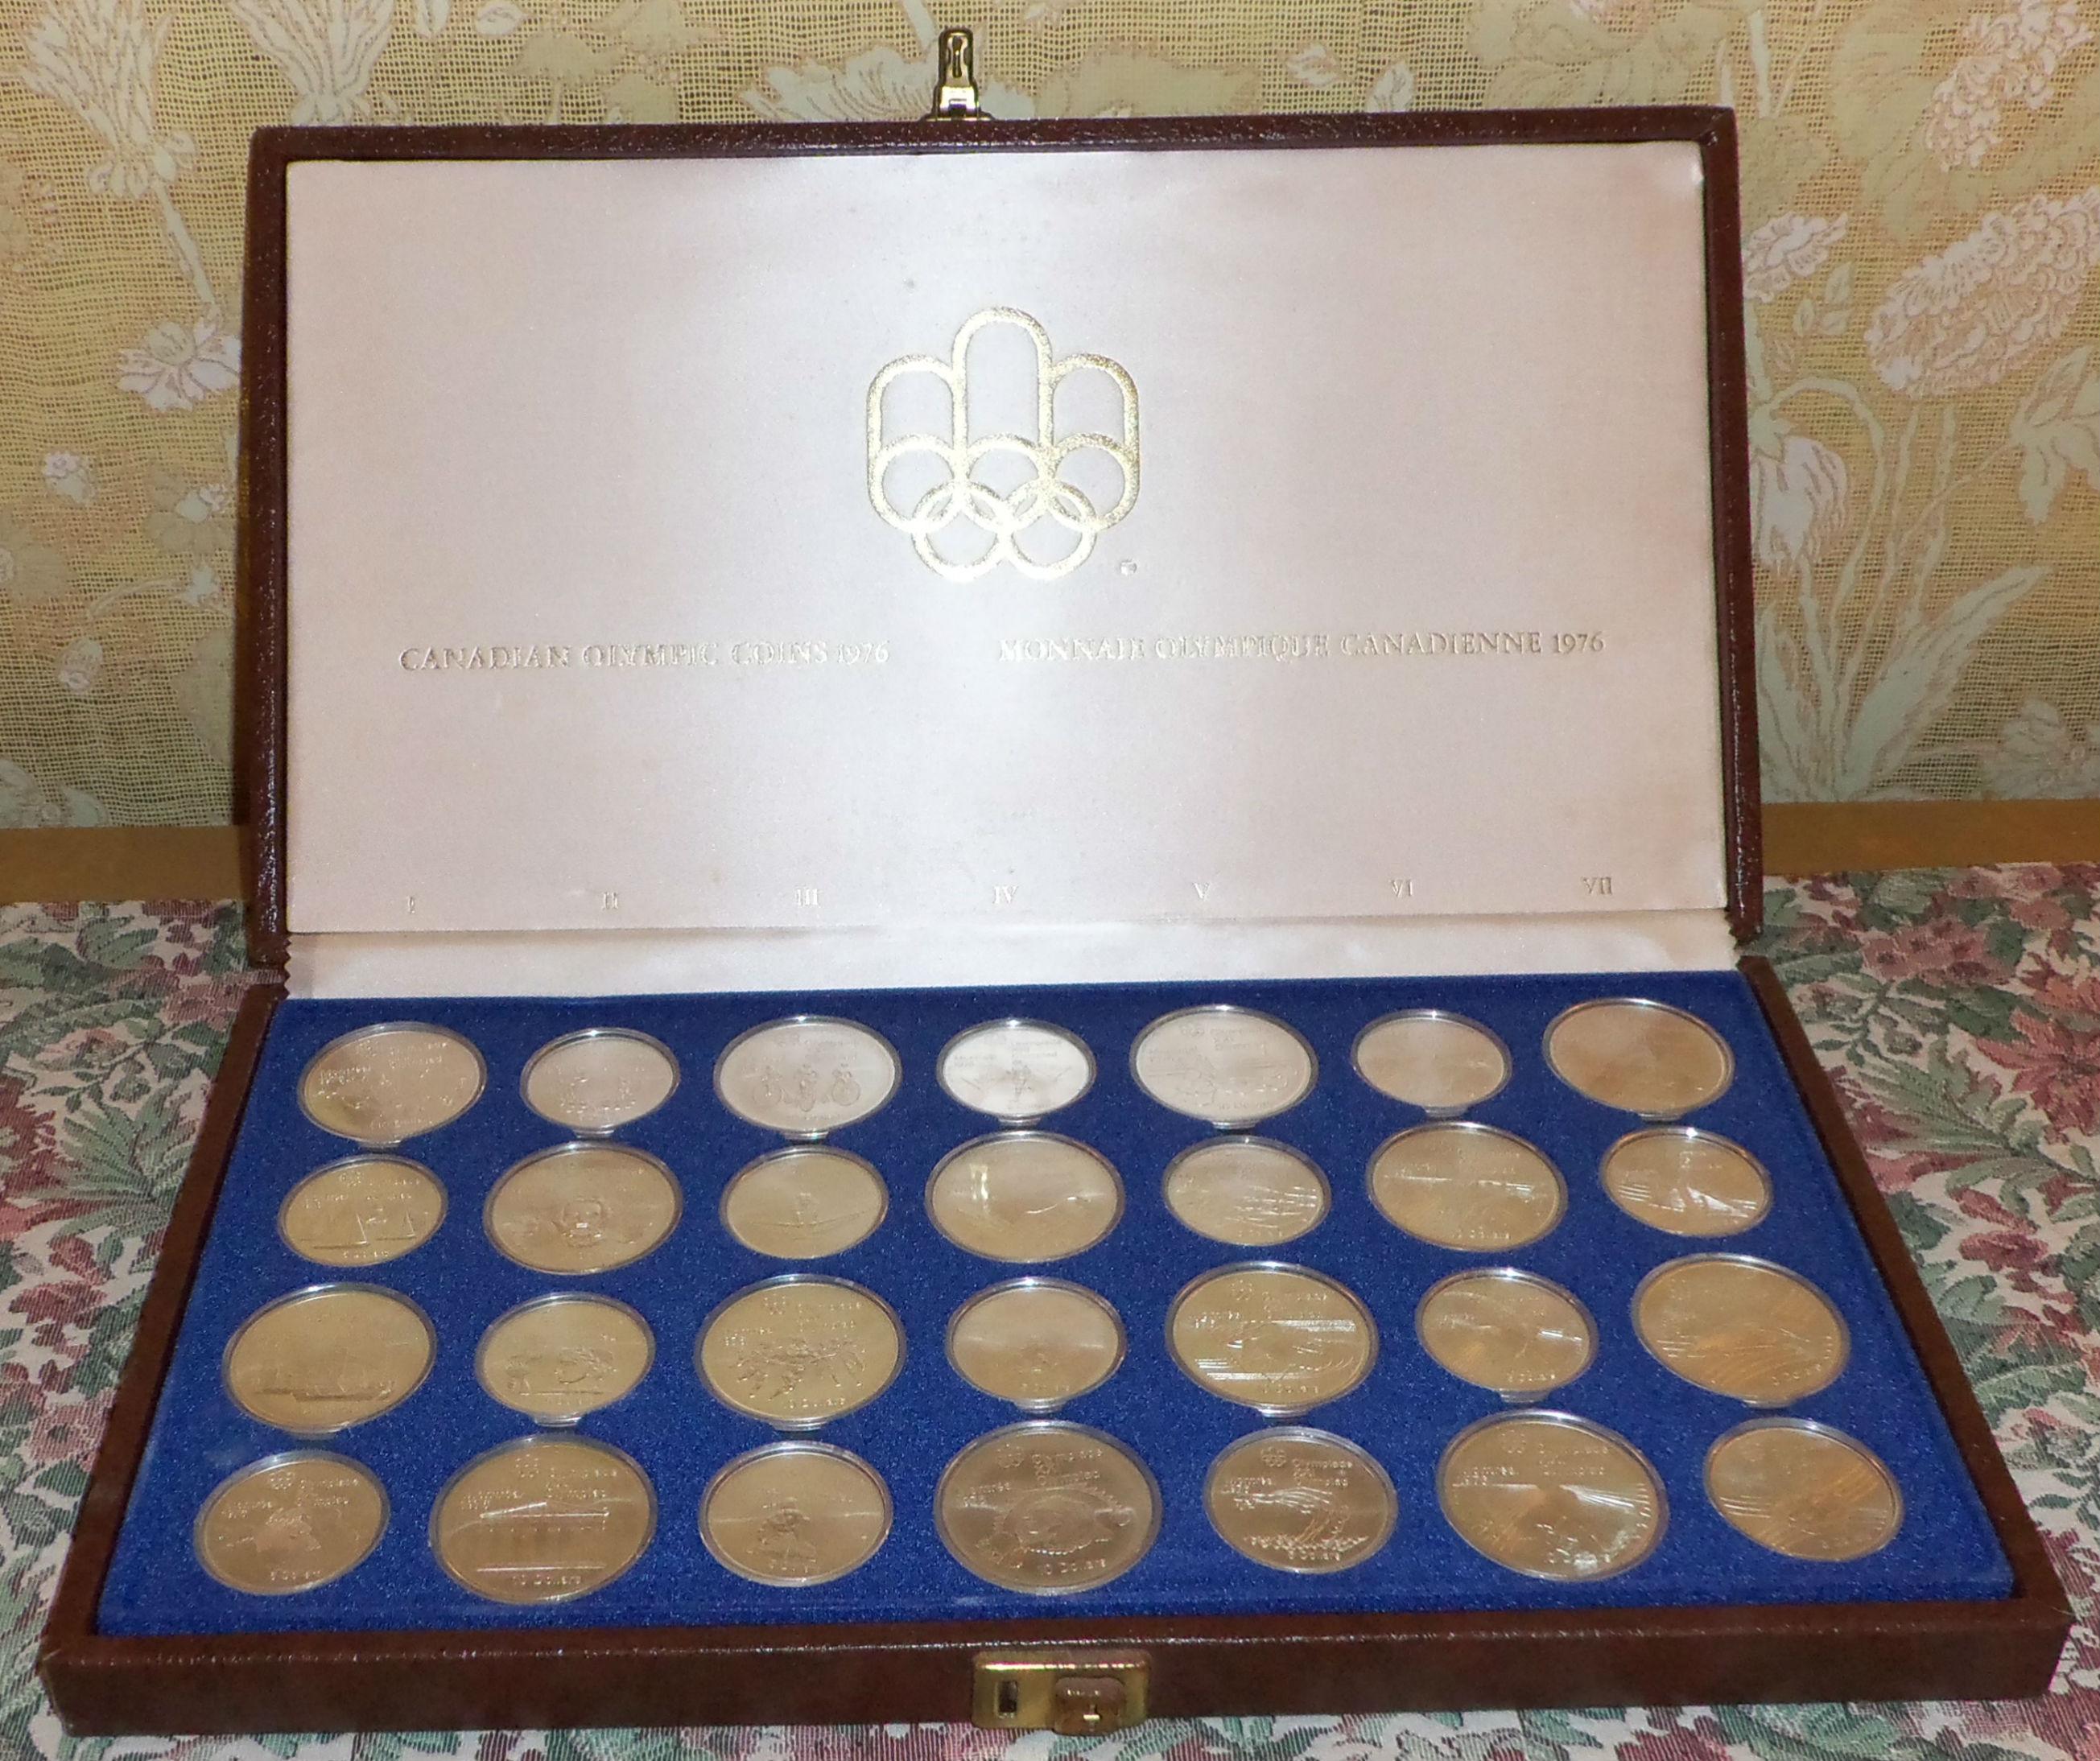 Value Of Canada 1976 Montreal Olympics Xxi Olympiad 28